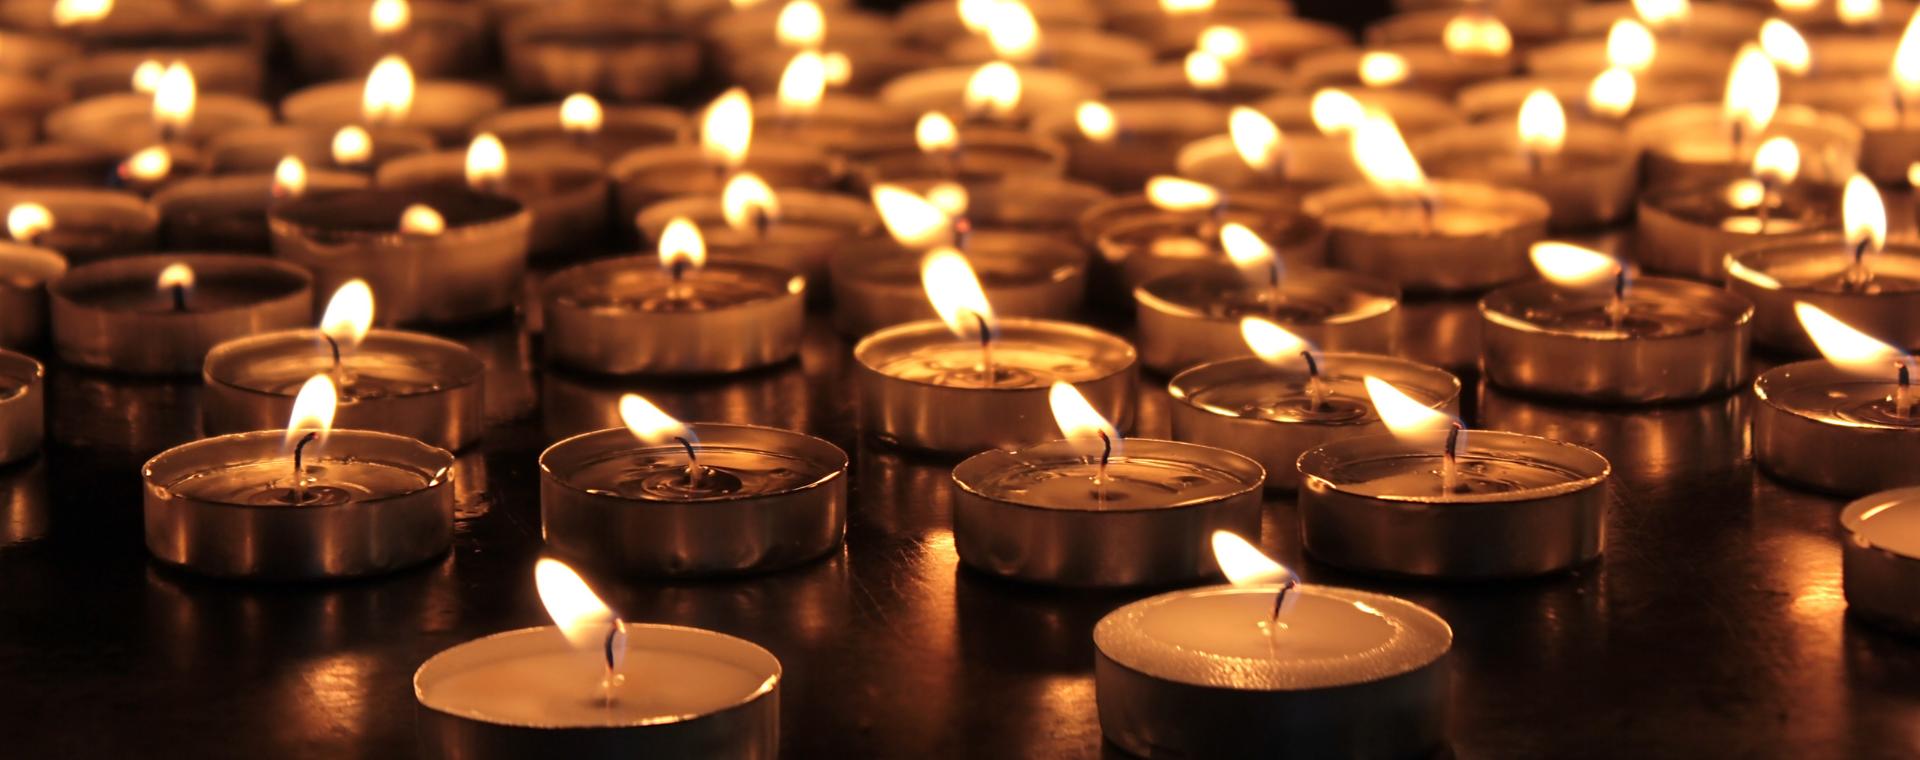 2021 Virtual Candlelighting